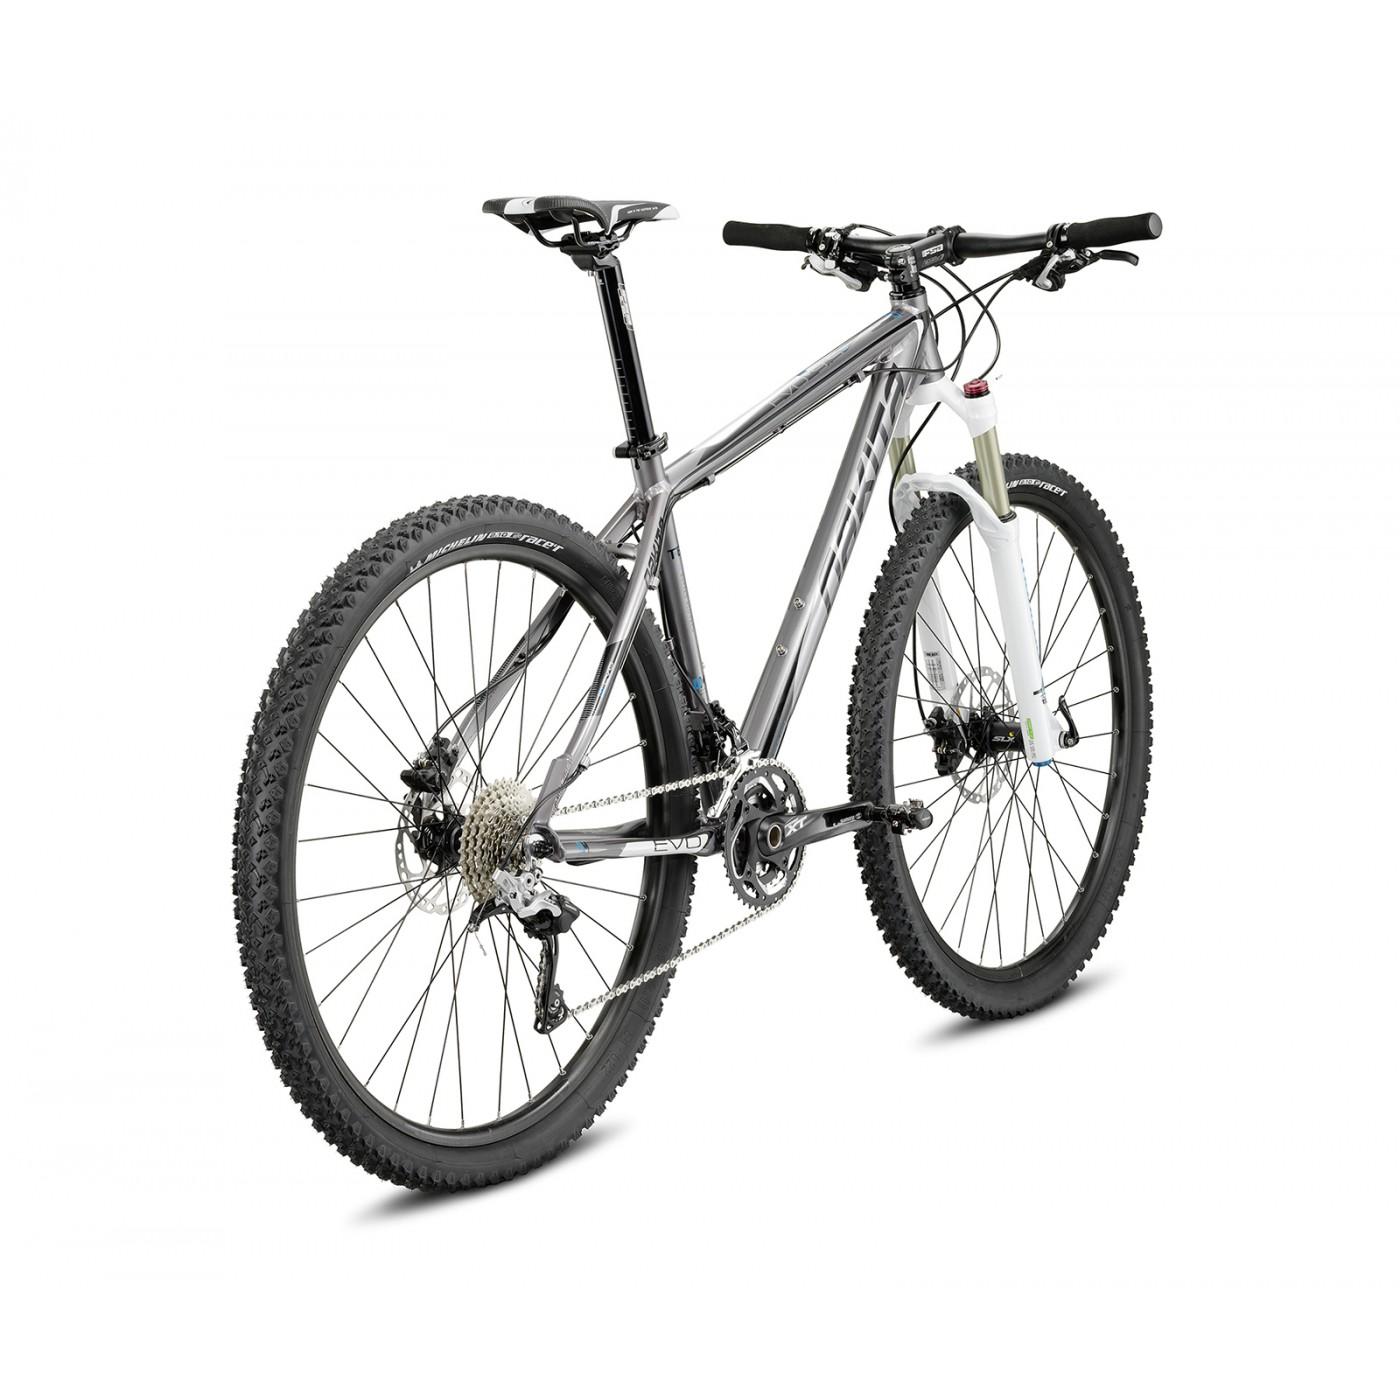 Bike Nakita Evo 9 5 Big